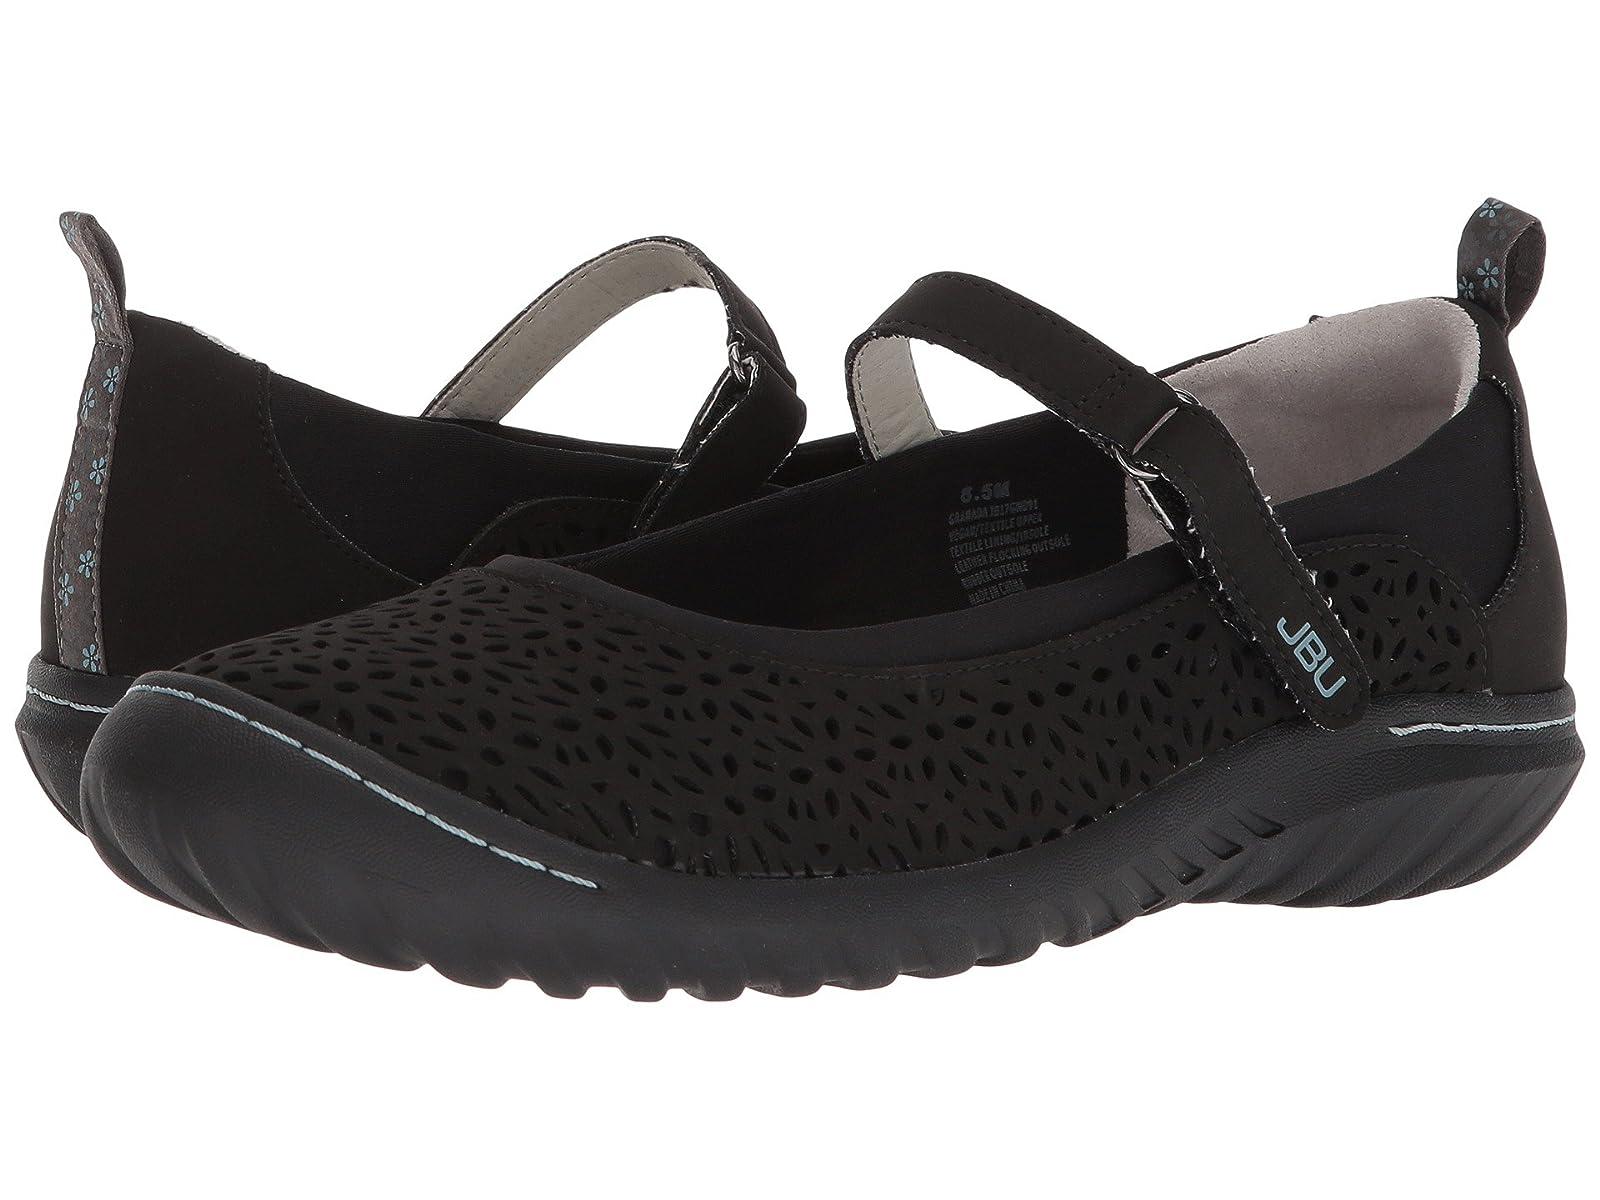 JBU GranadaAtmospheric grades have affordable shoes